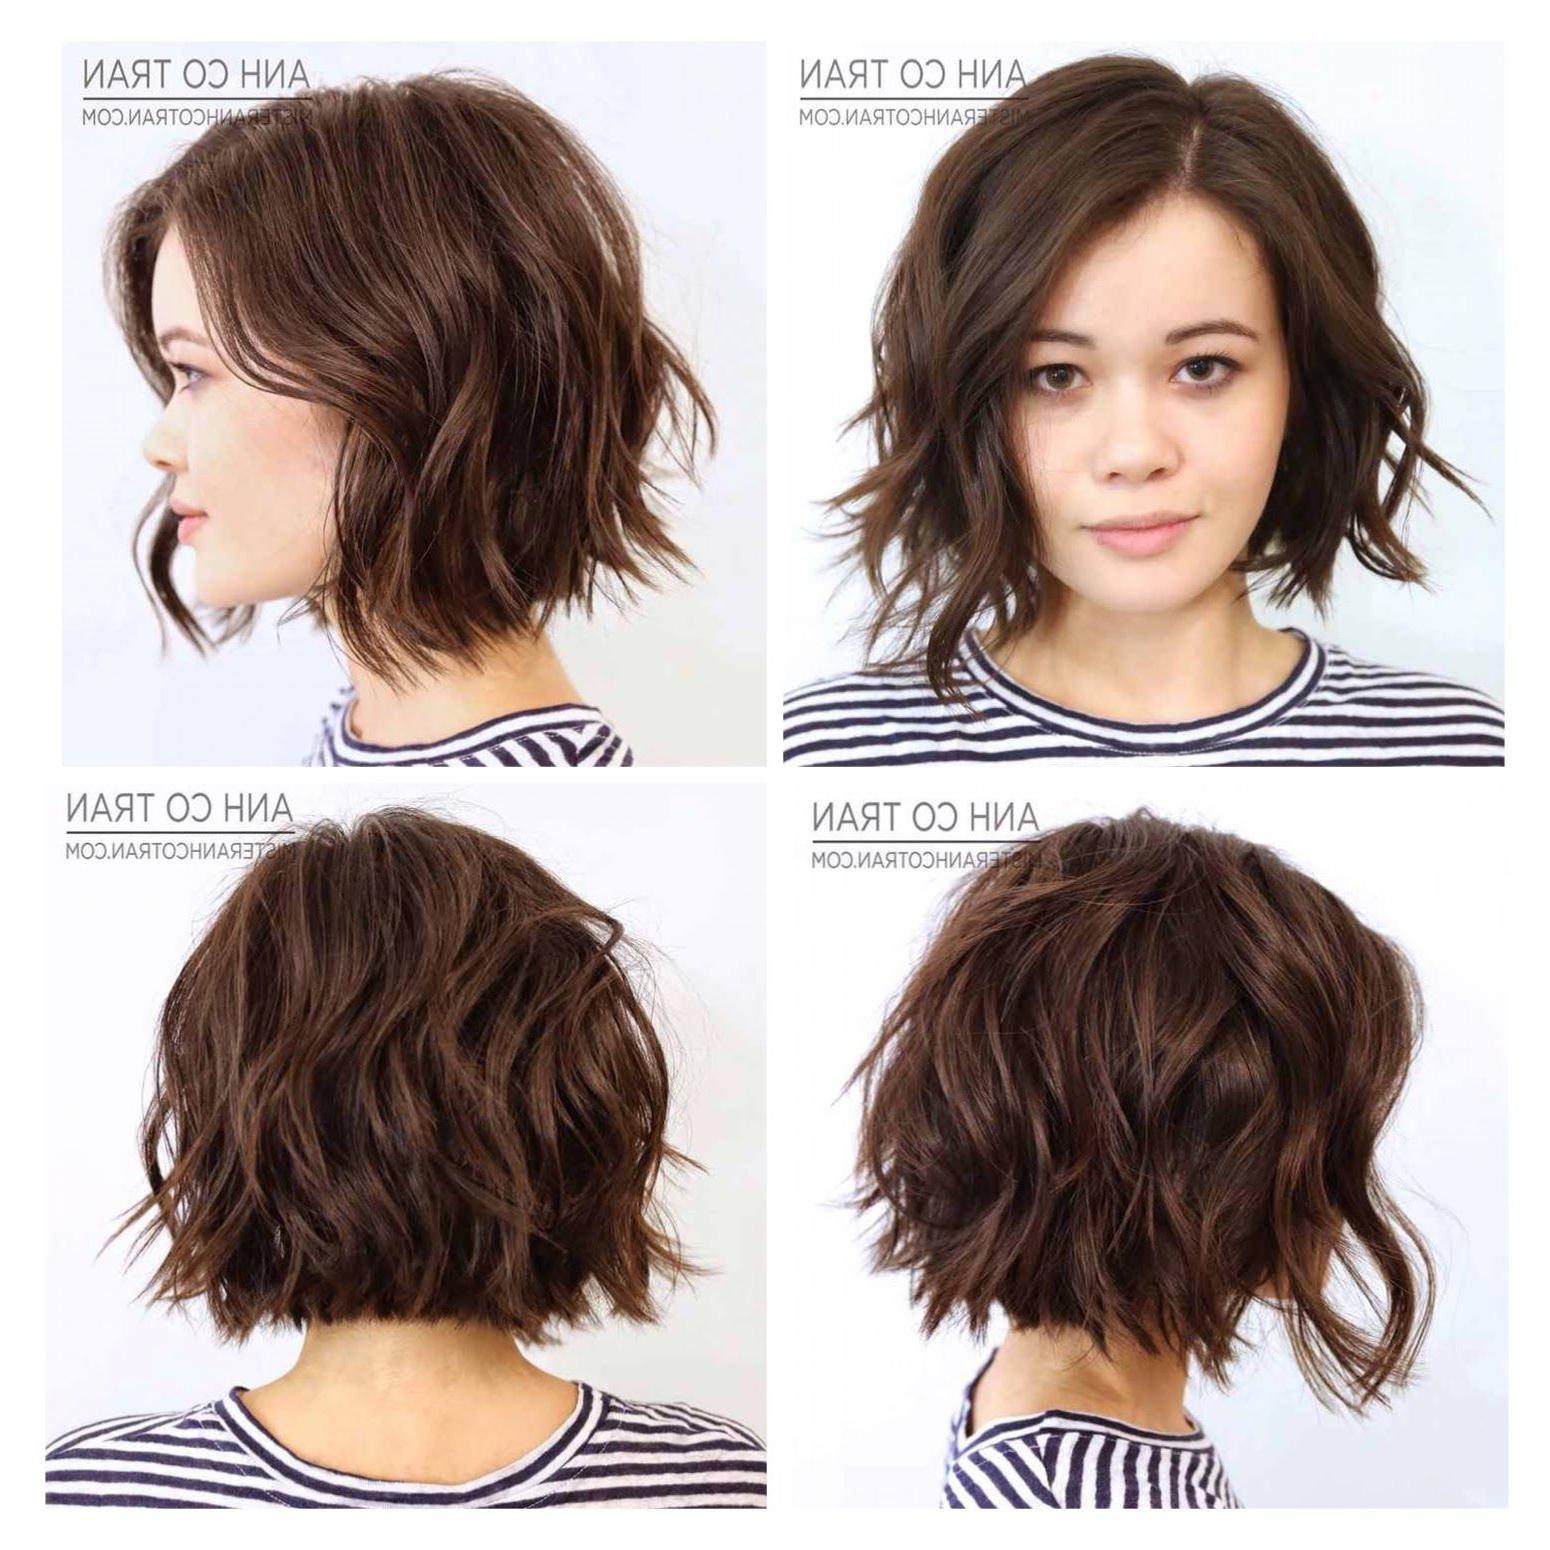 Pintara Catalano Studios On Hair | Hair, Hair Cuts, Hair For Slightly Angled Messy Bob Hairstyles (View 4 of 20)